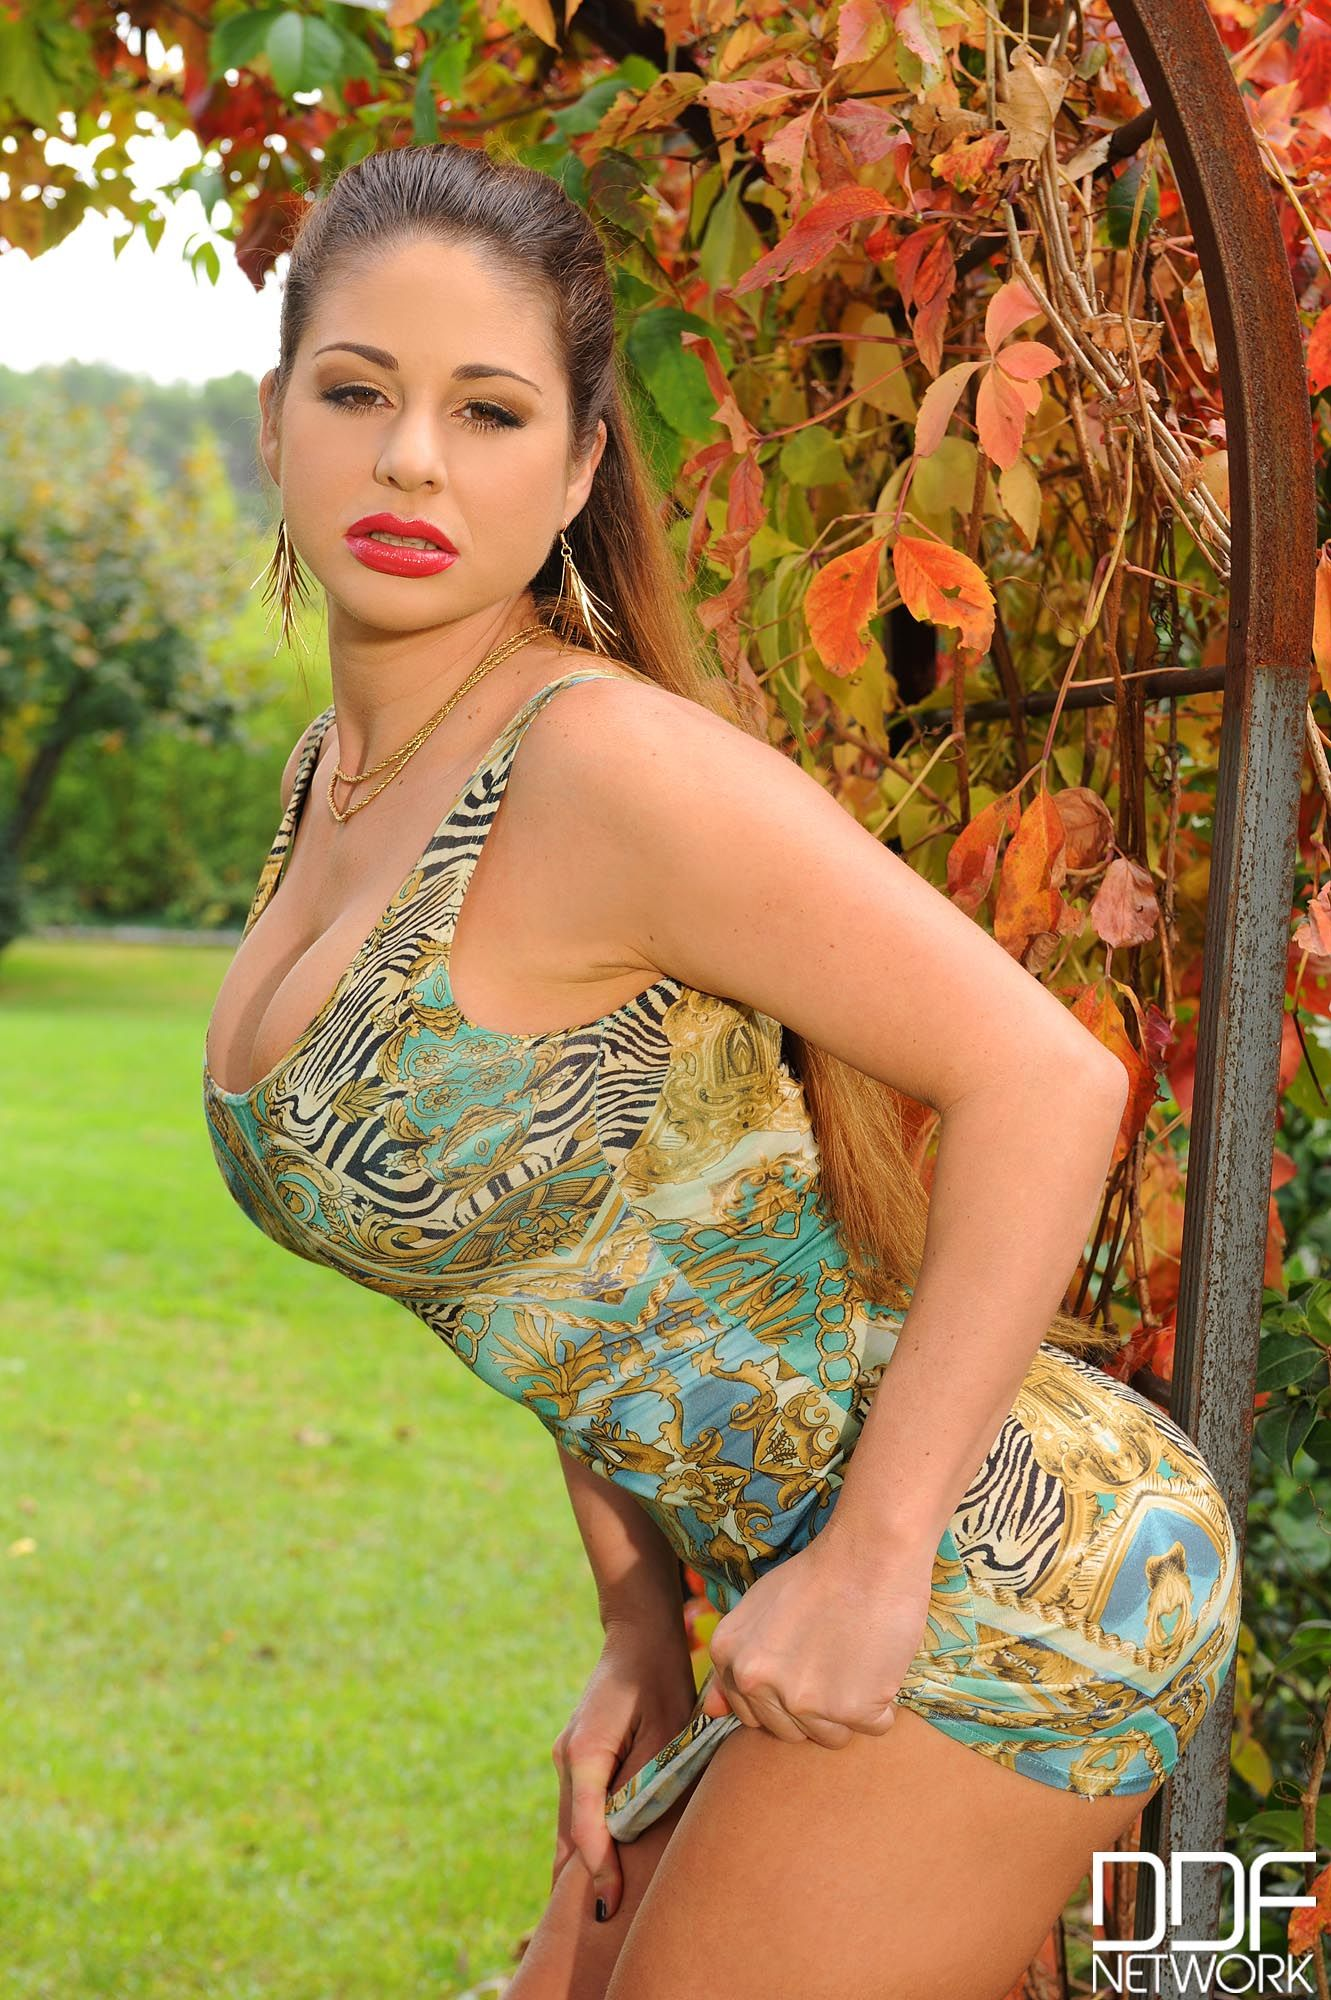 cathy heaven sexy pornstar | latina love it | pinterest | latina